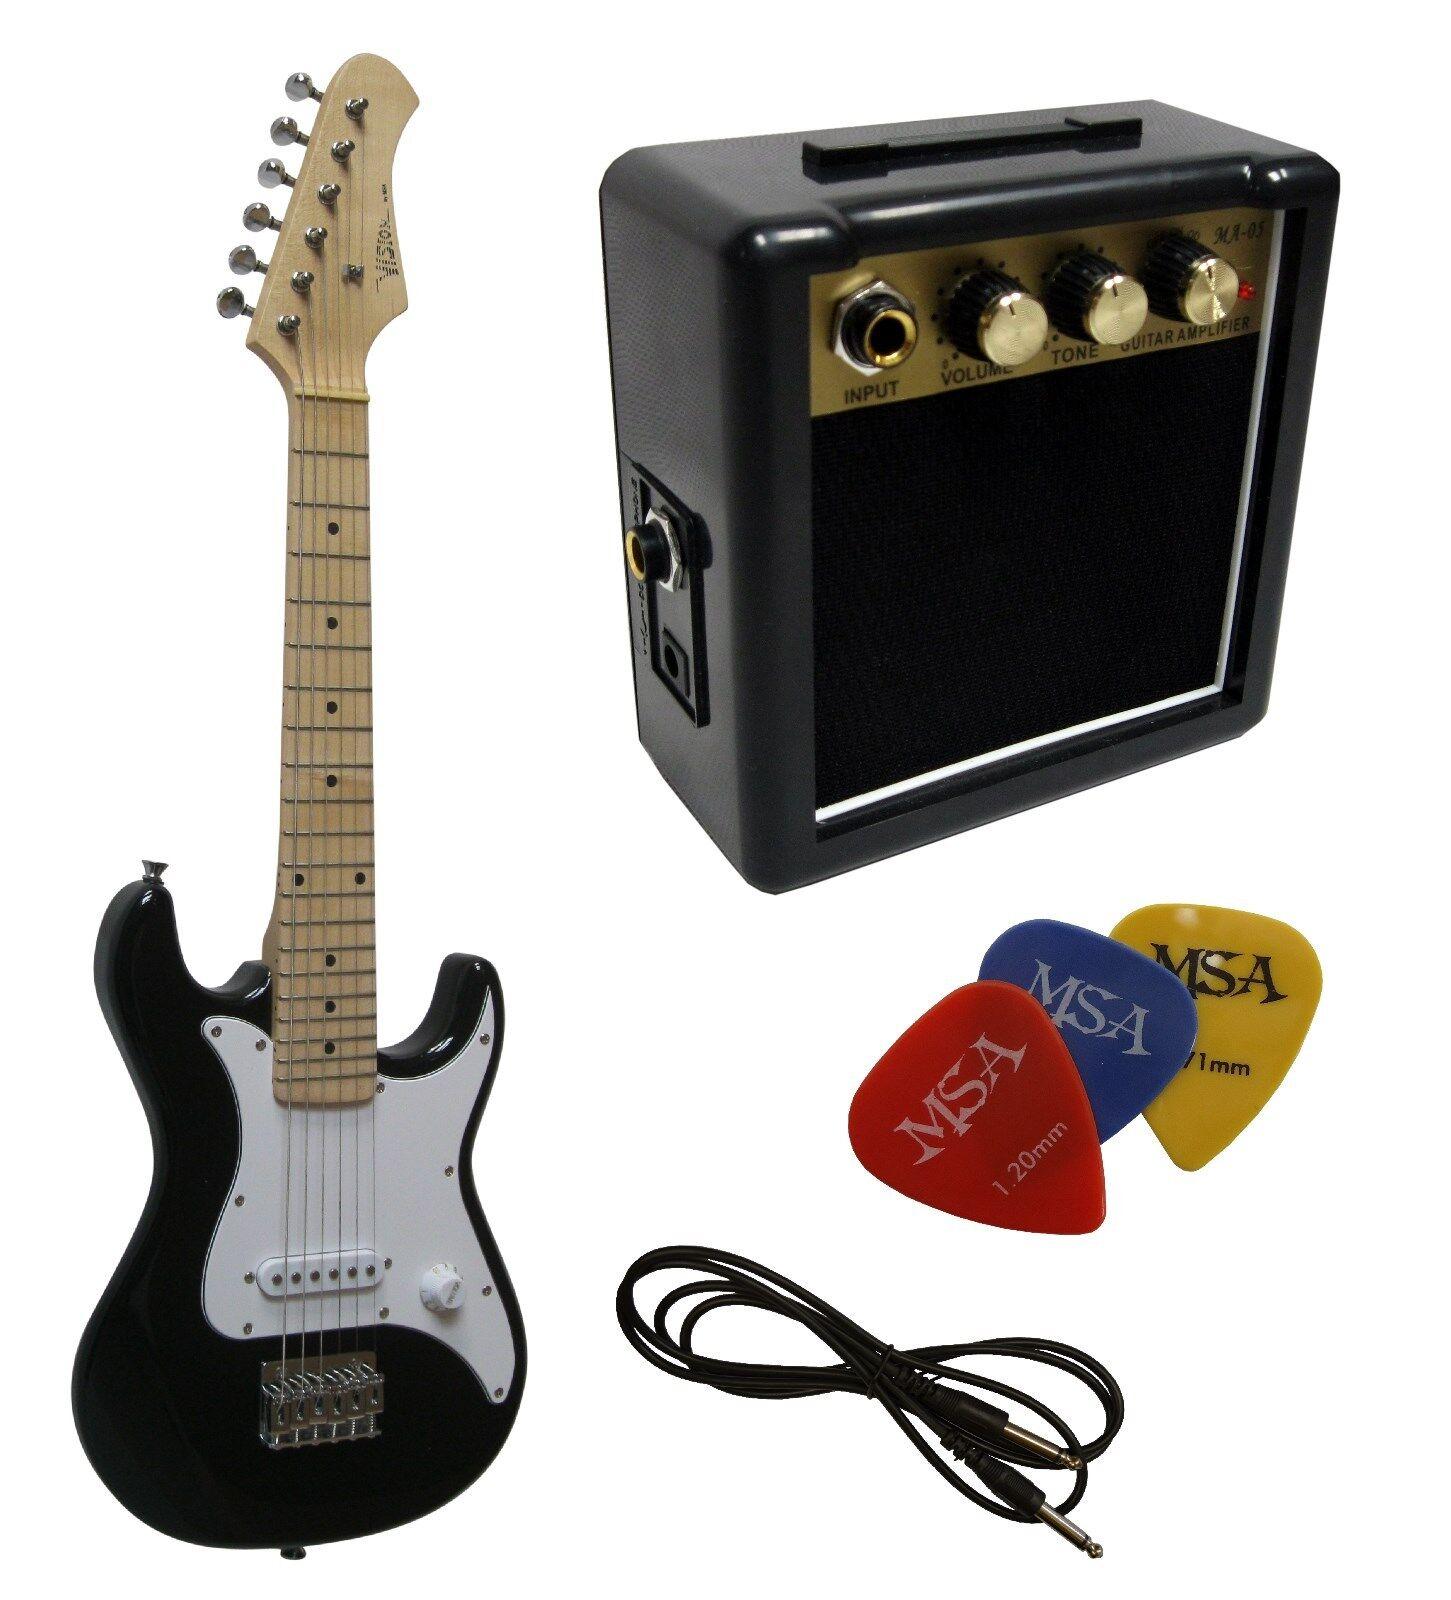 E-Gitarre für Kinder Mini 76cm - schwarz - Kabel+ Verstärker MA05 + 3Pik + EK300